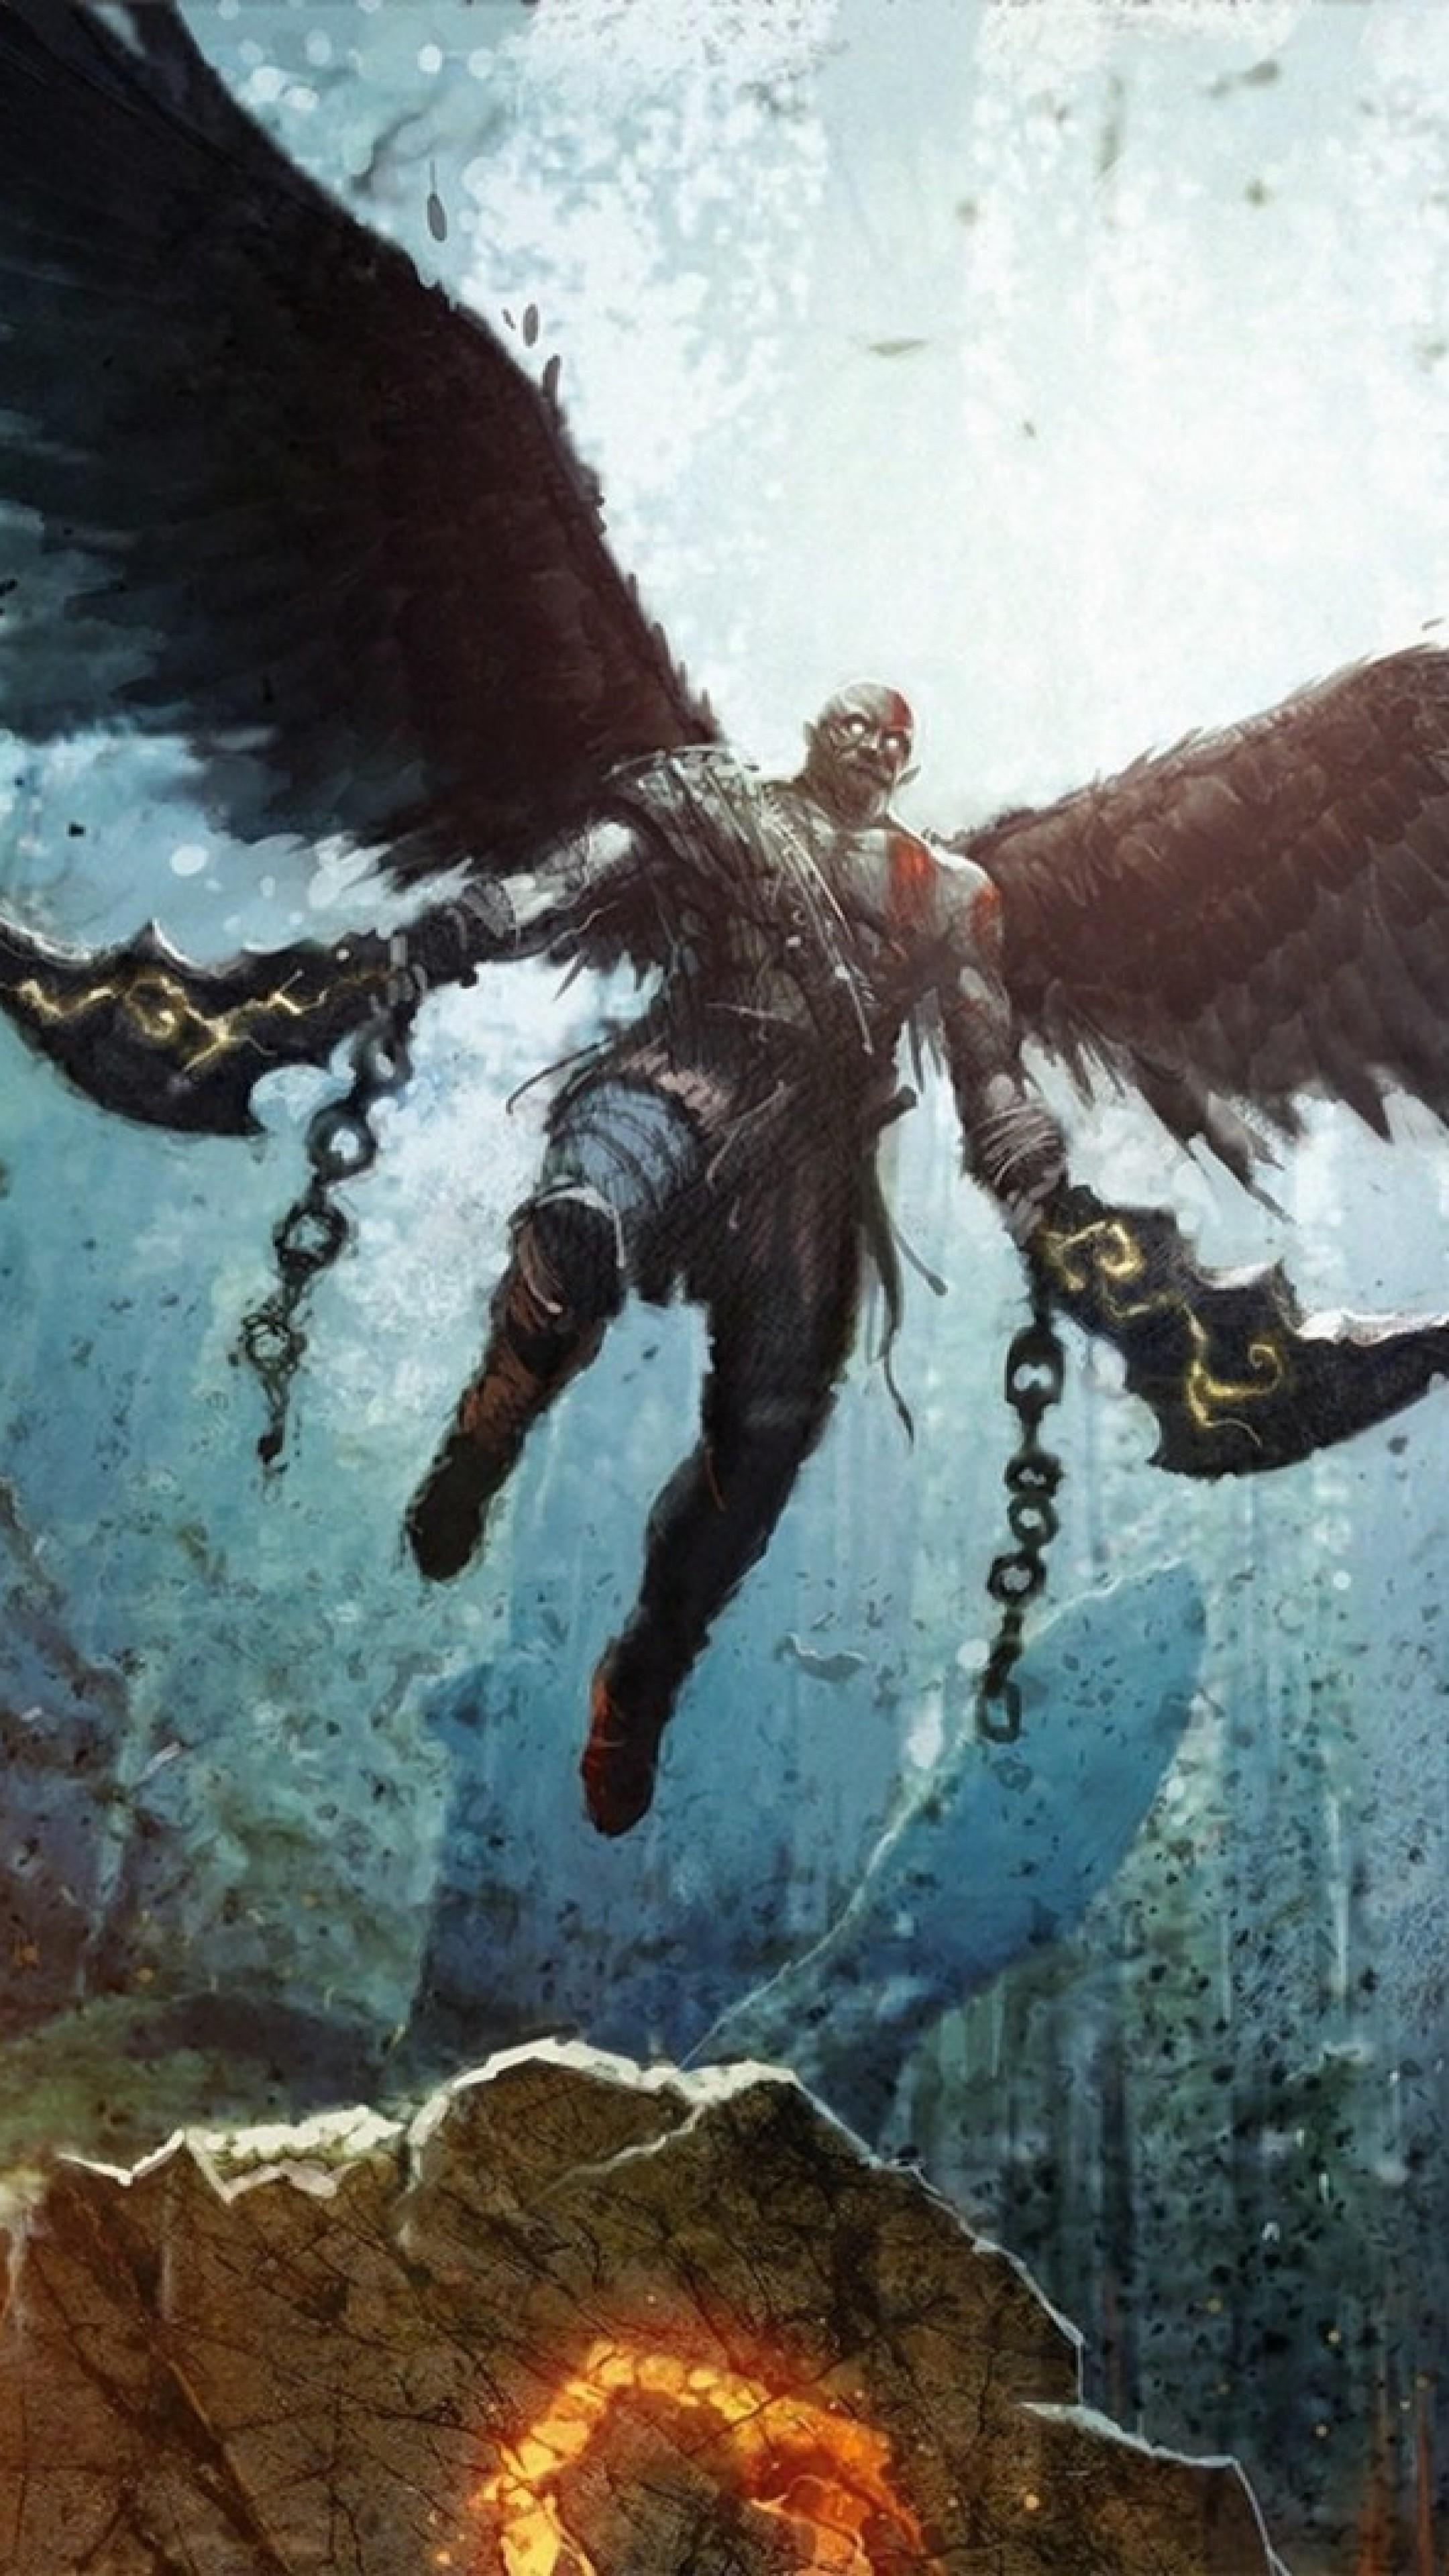 1920x1080 Find Out God Of War Ascension Ares Wallpaper On Hdpicorner